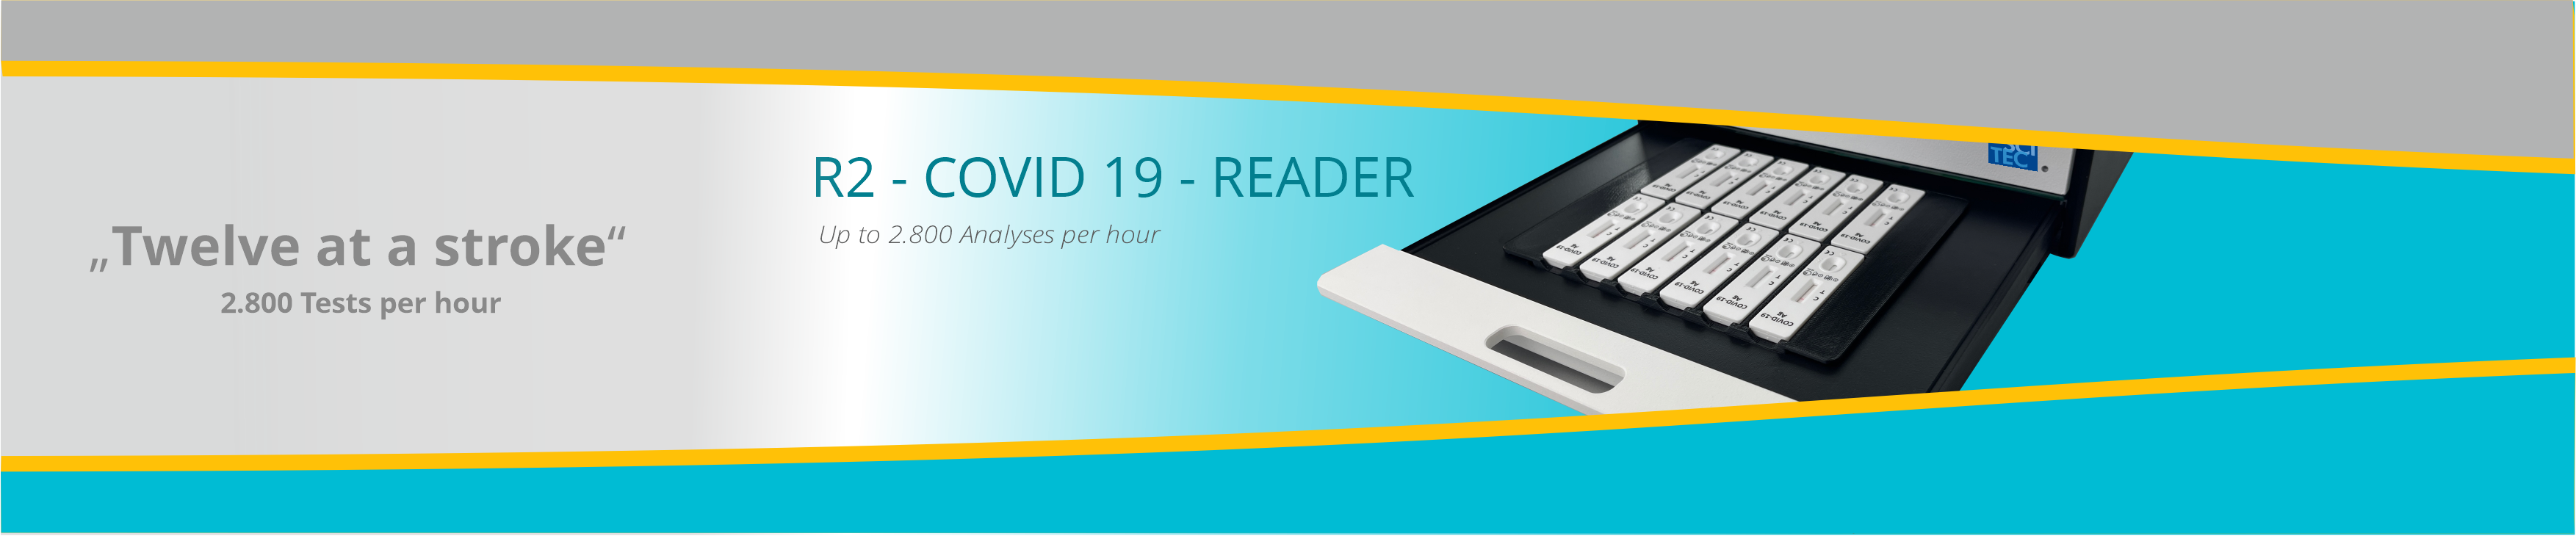 COVID Test REader R2